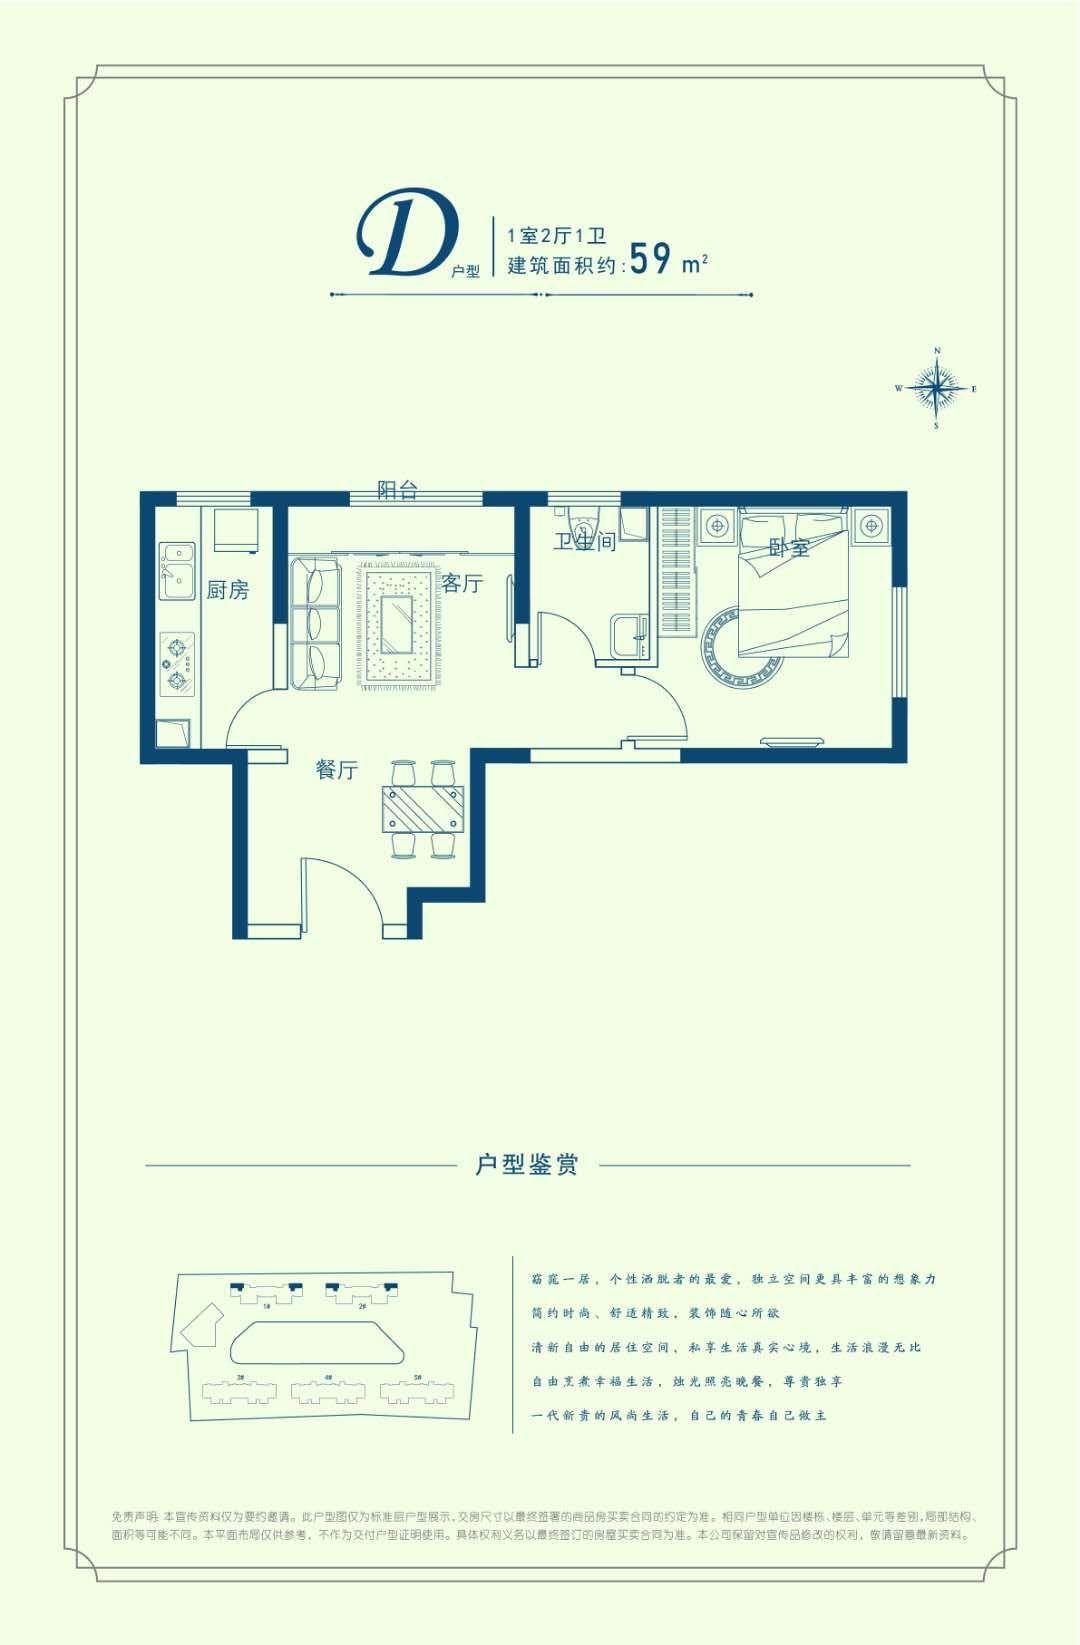 D户型1室2厅59平